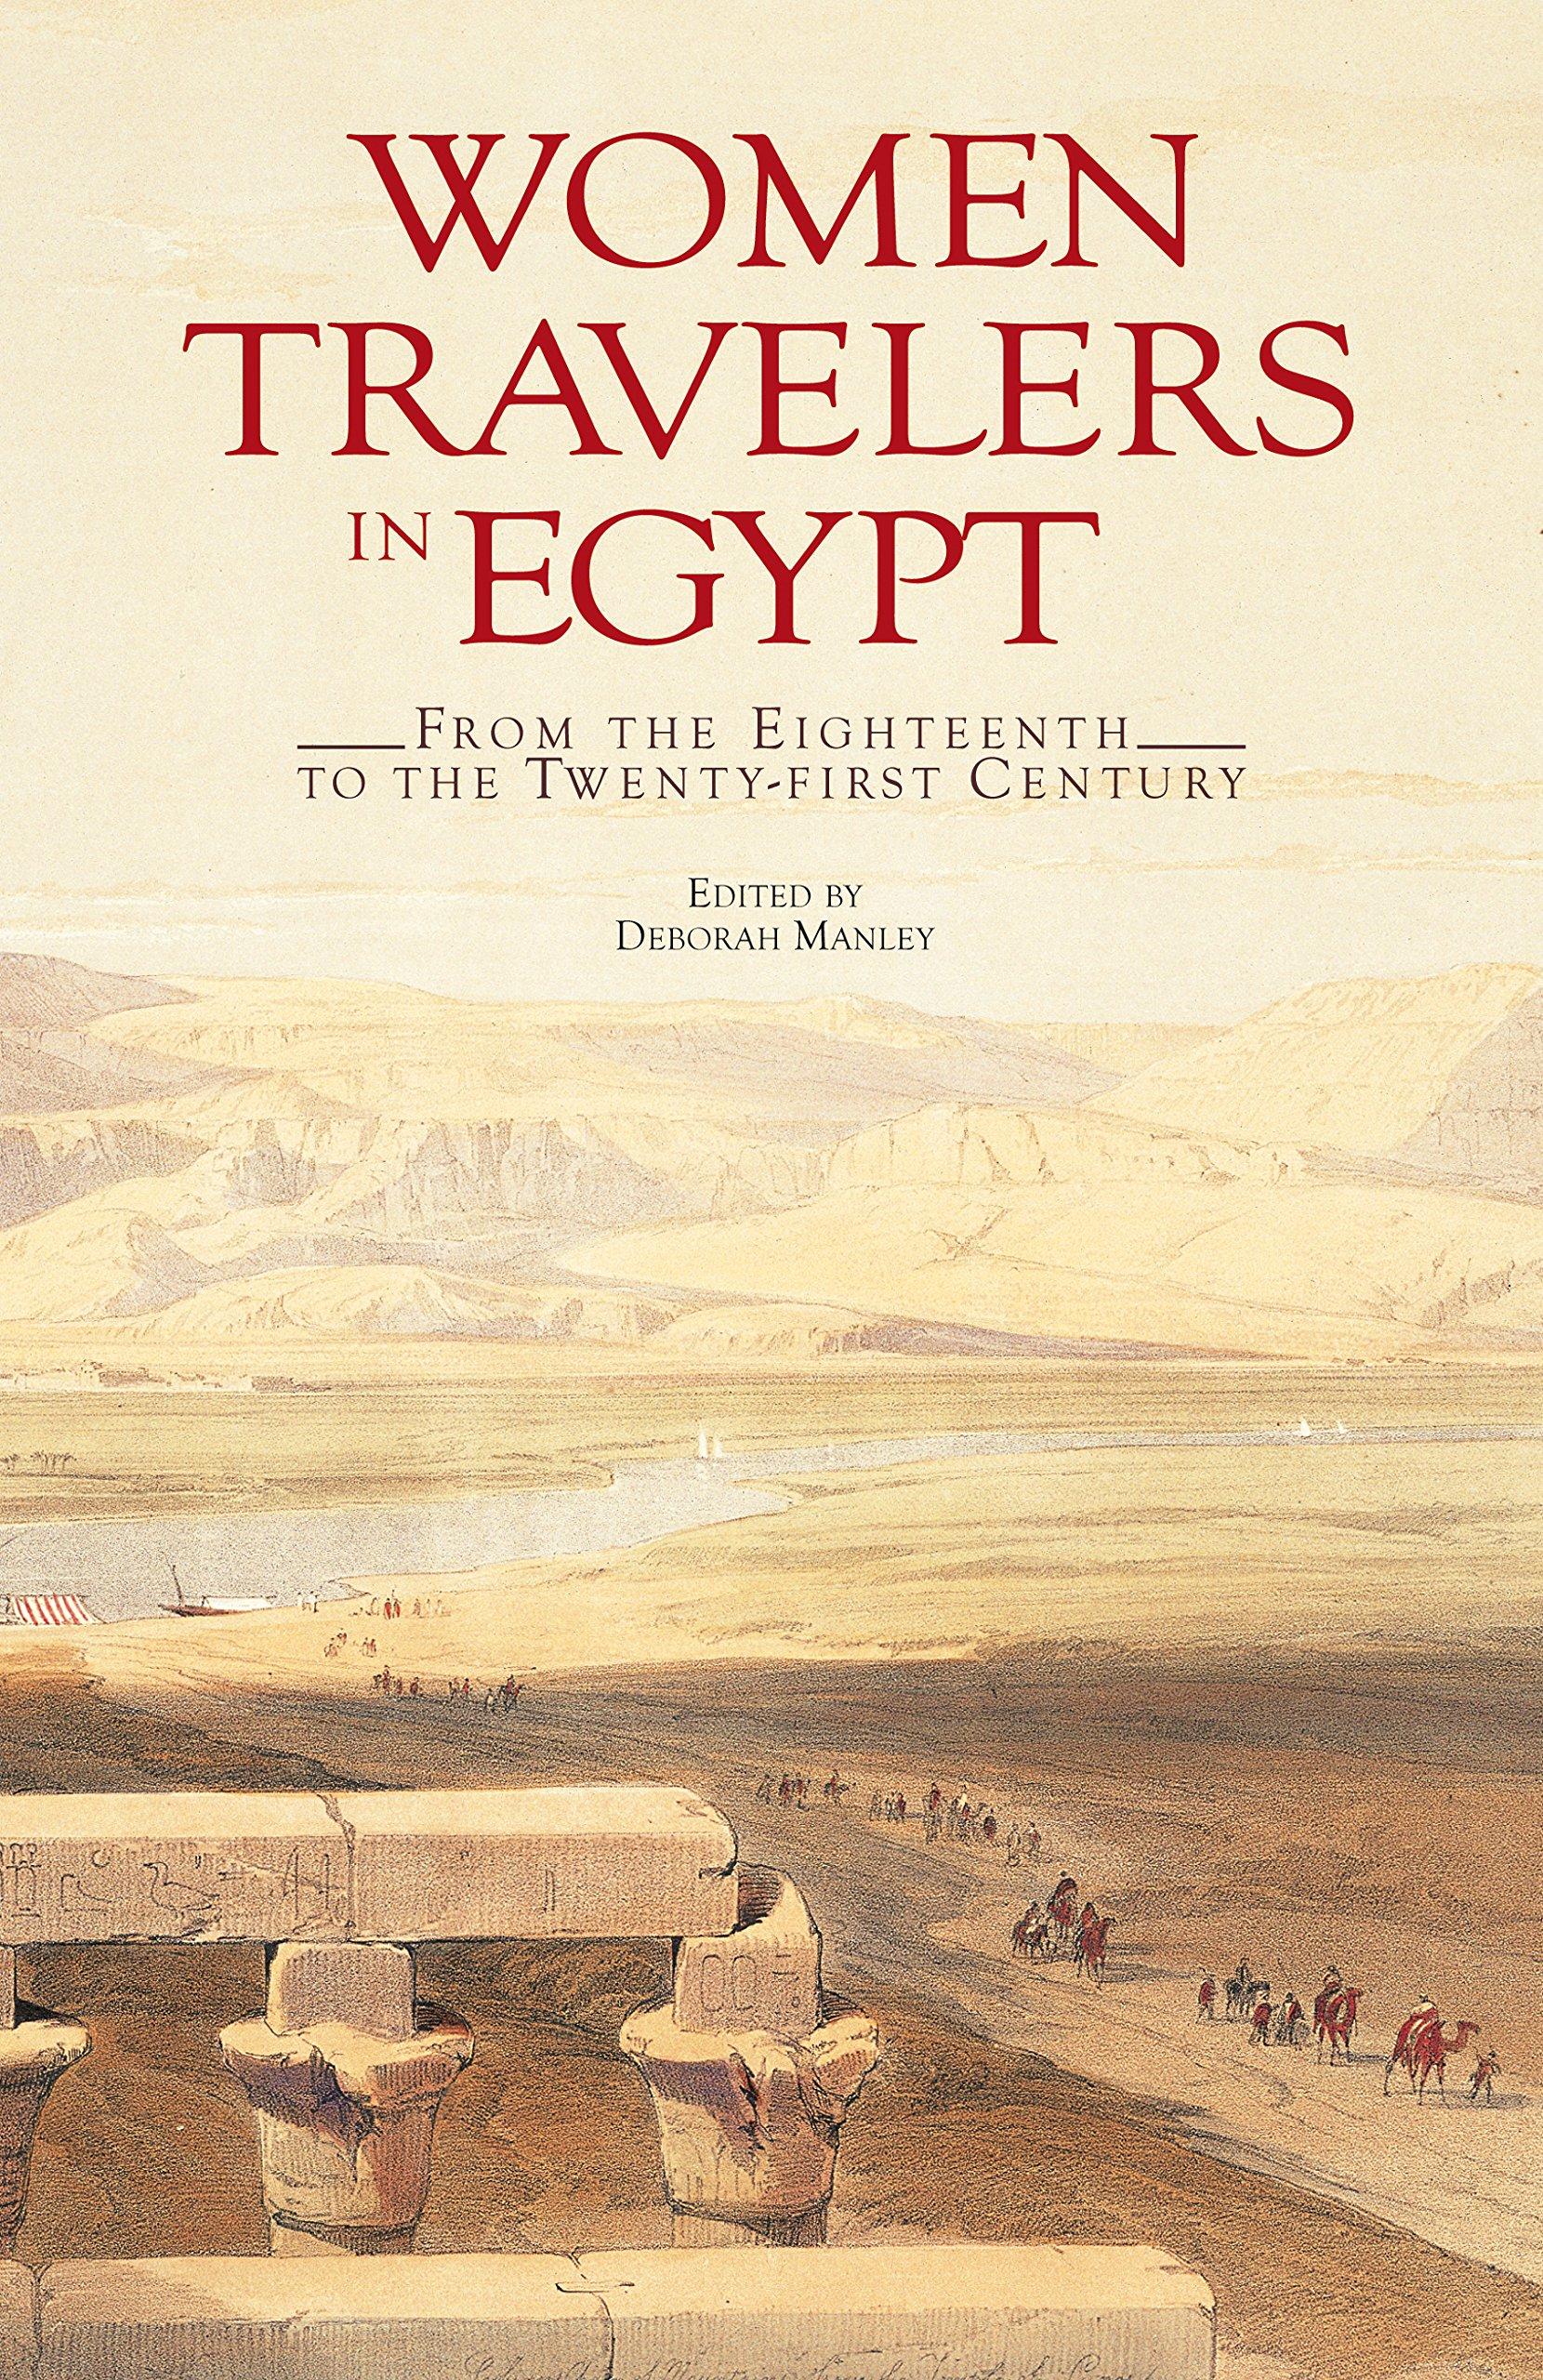 Women Travelers In Egypt From The Eighteenth To The Twenty First Century Manley Deborah 9789774164859 Amazon Com Books